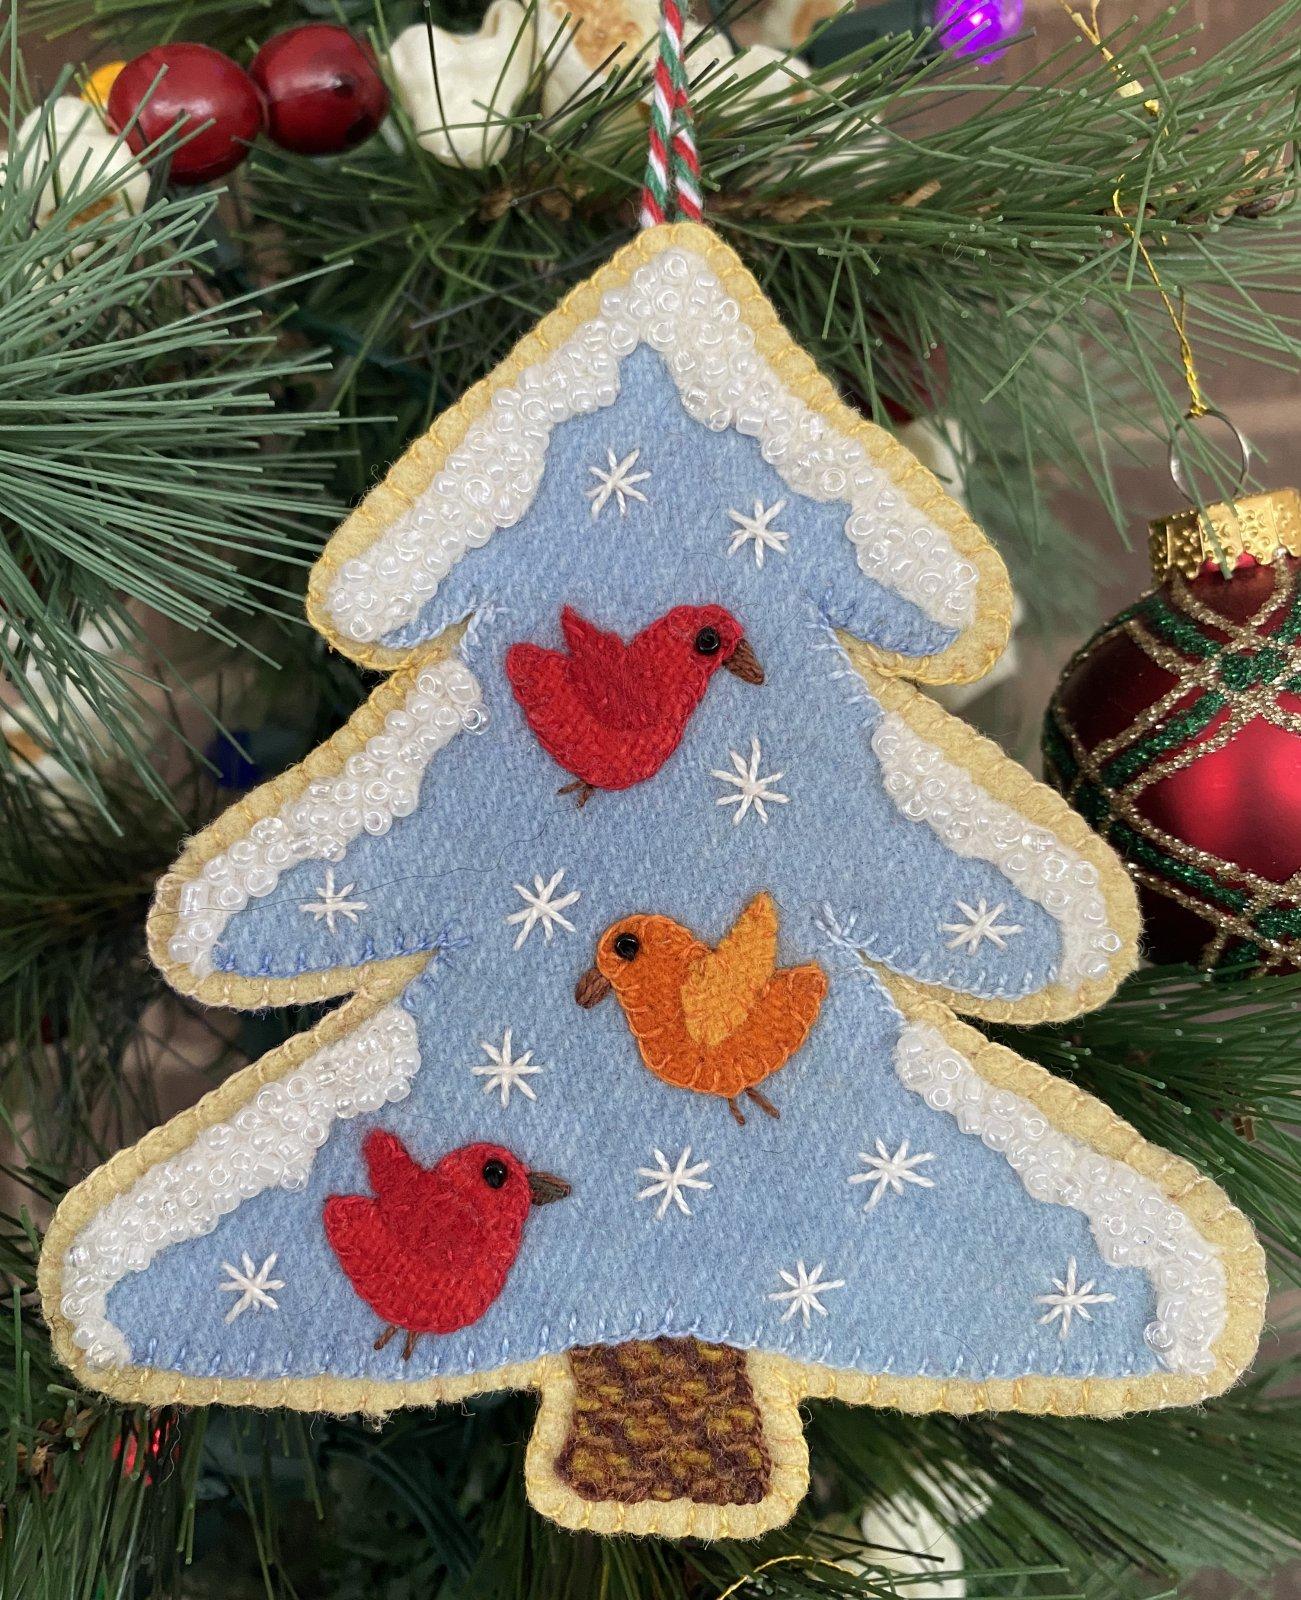 Sugar Plum Parrish Songbird Christmas Tree #11 Ornament Wool Kit with Printed Pattern